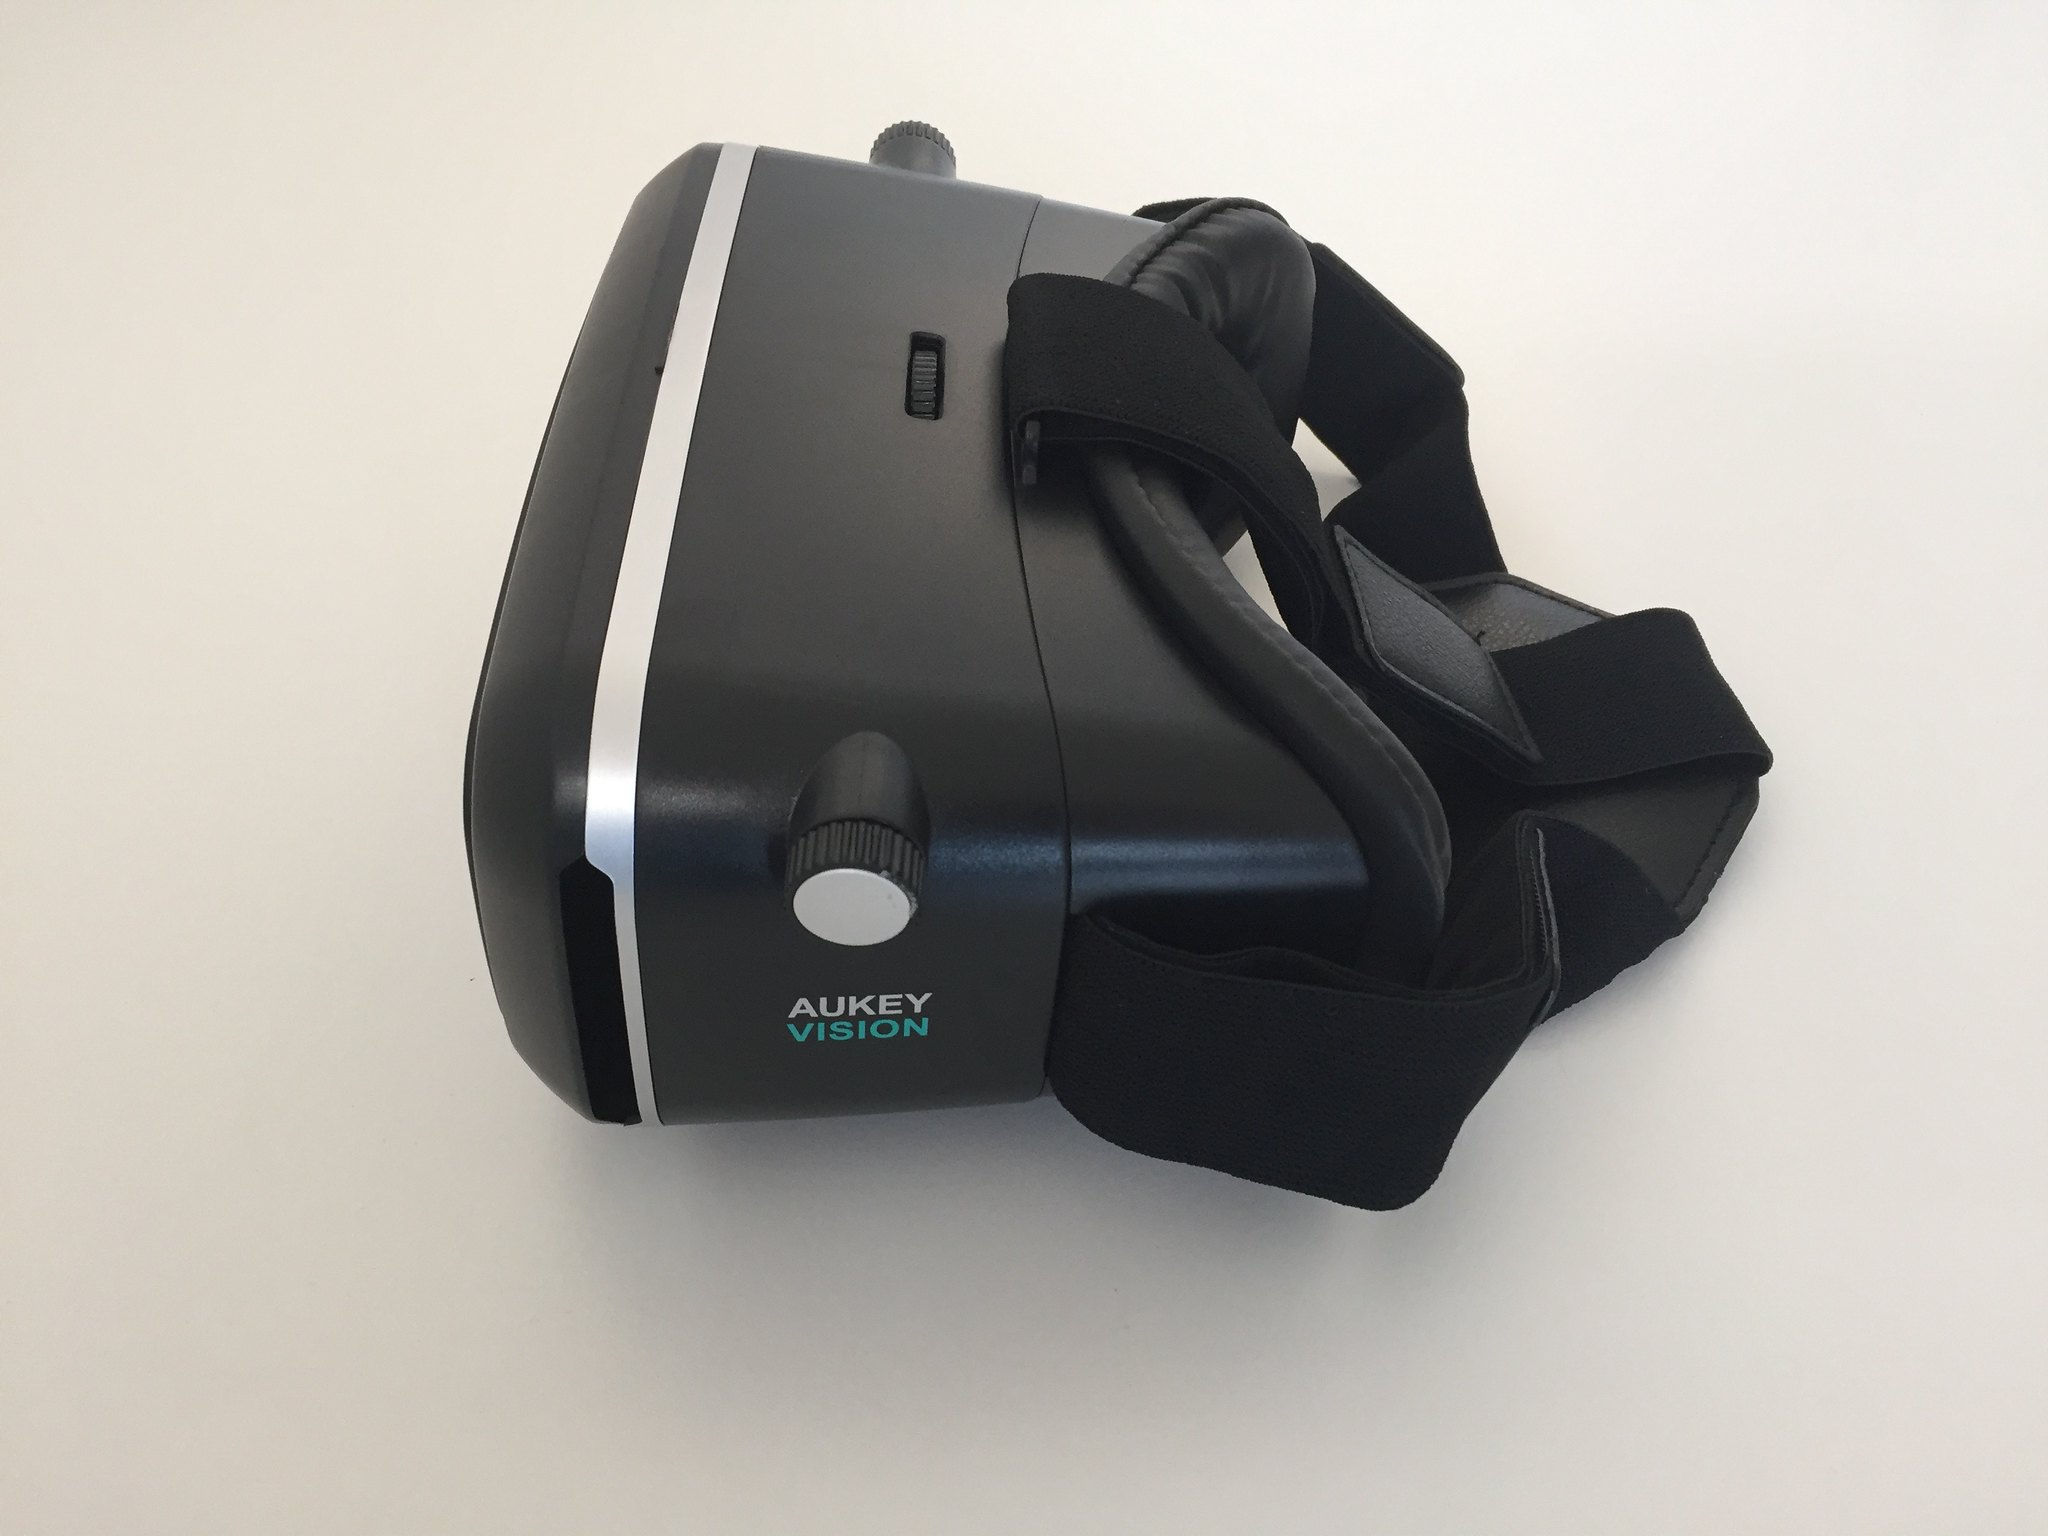 20170228 Casque VR Aukey VR-01 7